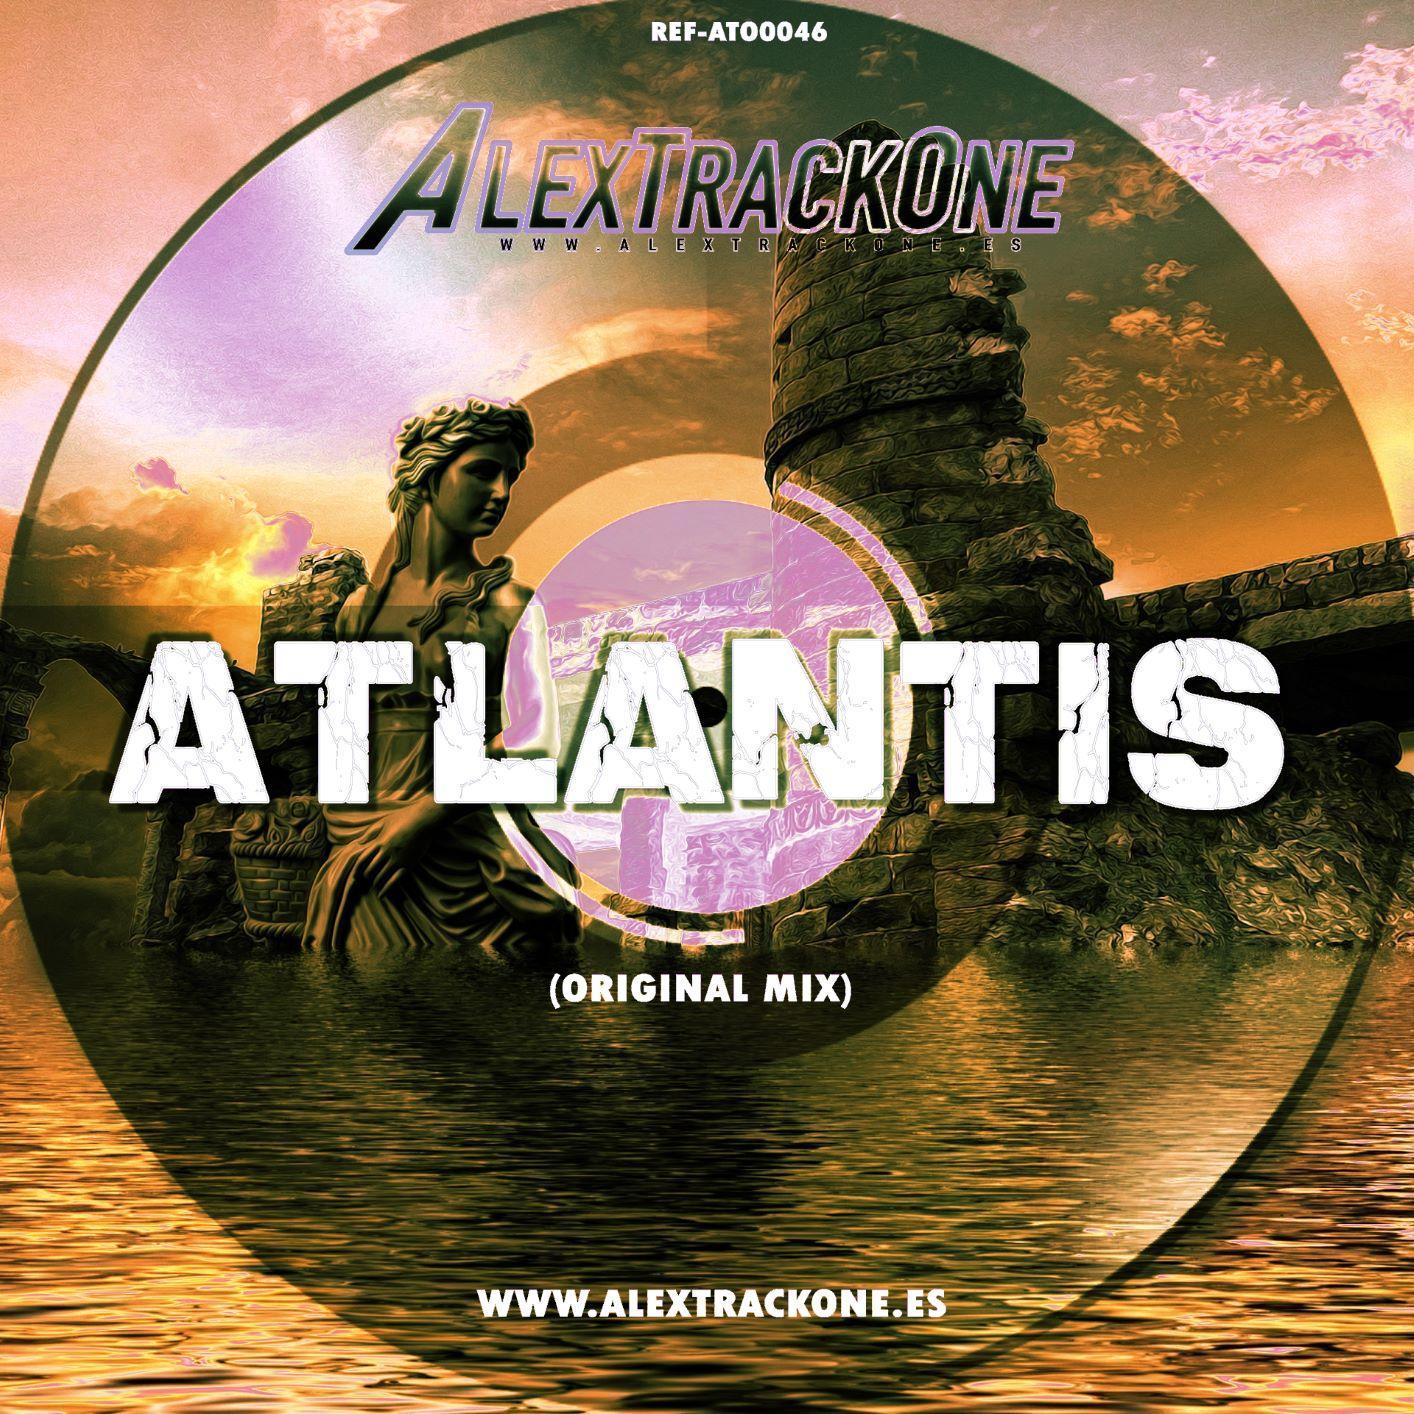 REF-ATO0046 ATLANTIS (ORIGINAL MIX) (MP3 & WAV)